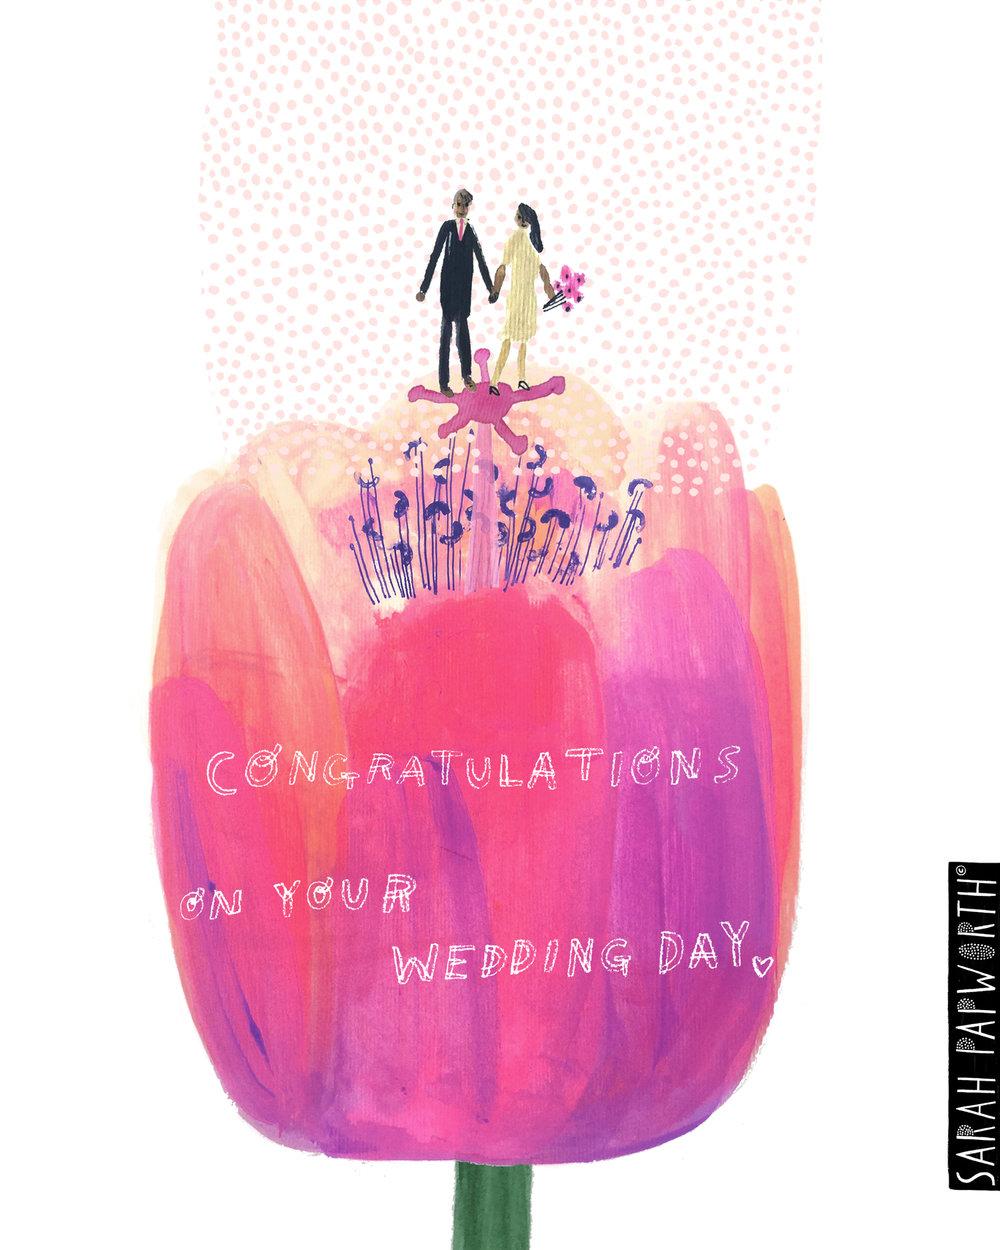 wedding day flower greeting occasion card sarah papworth.jpg